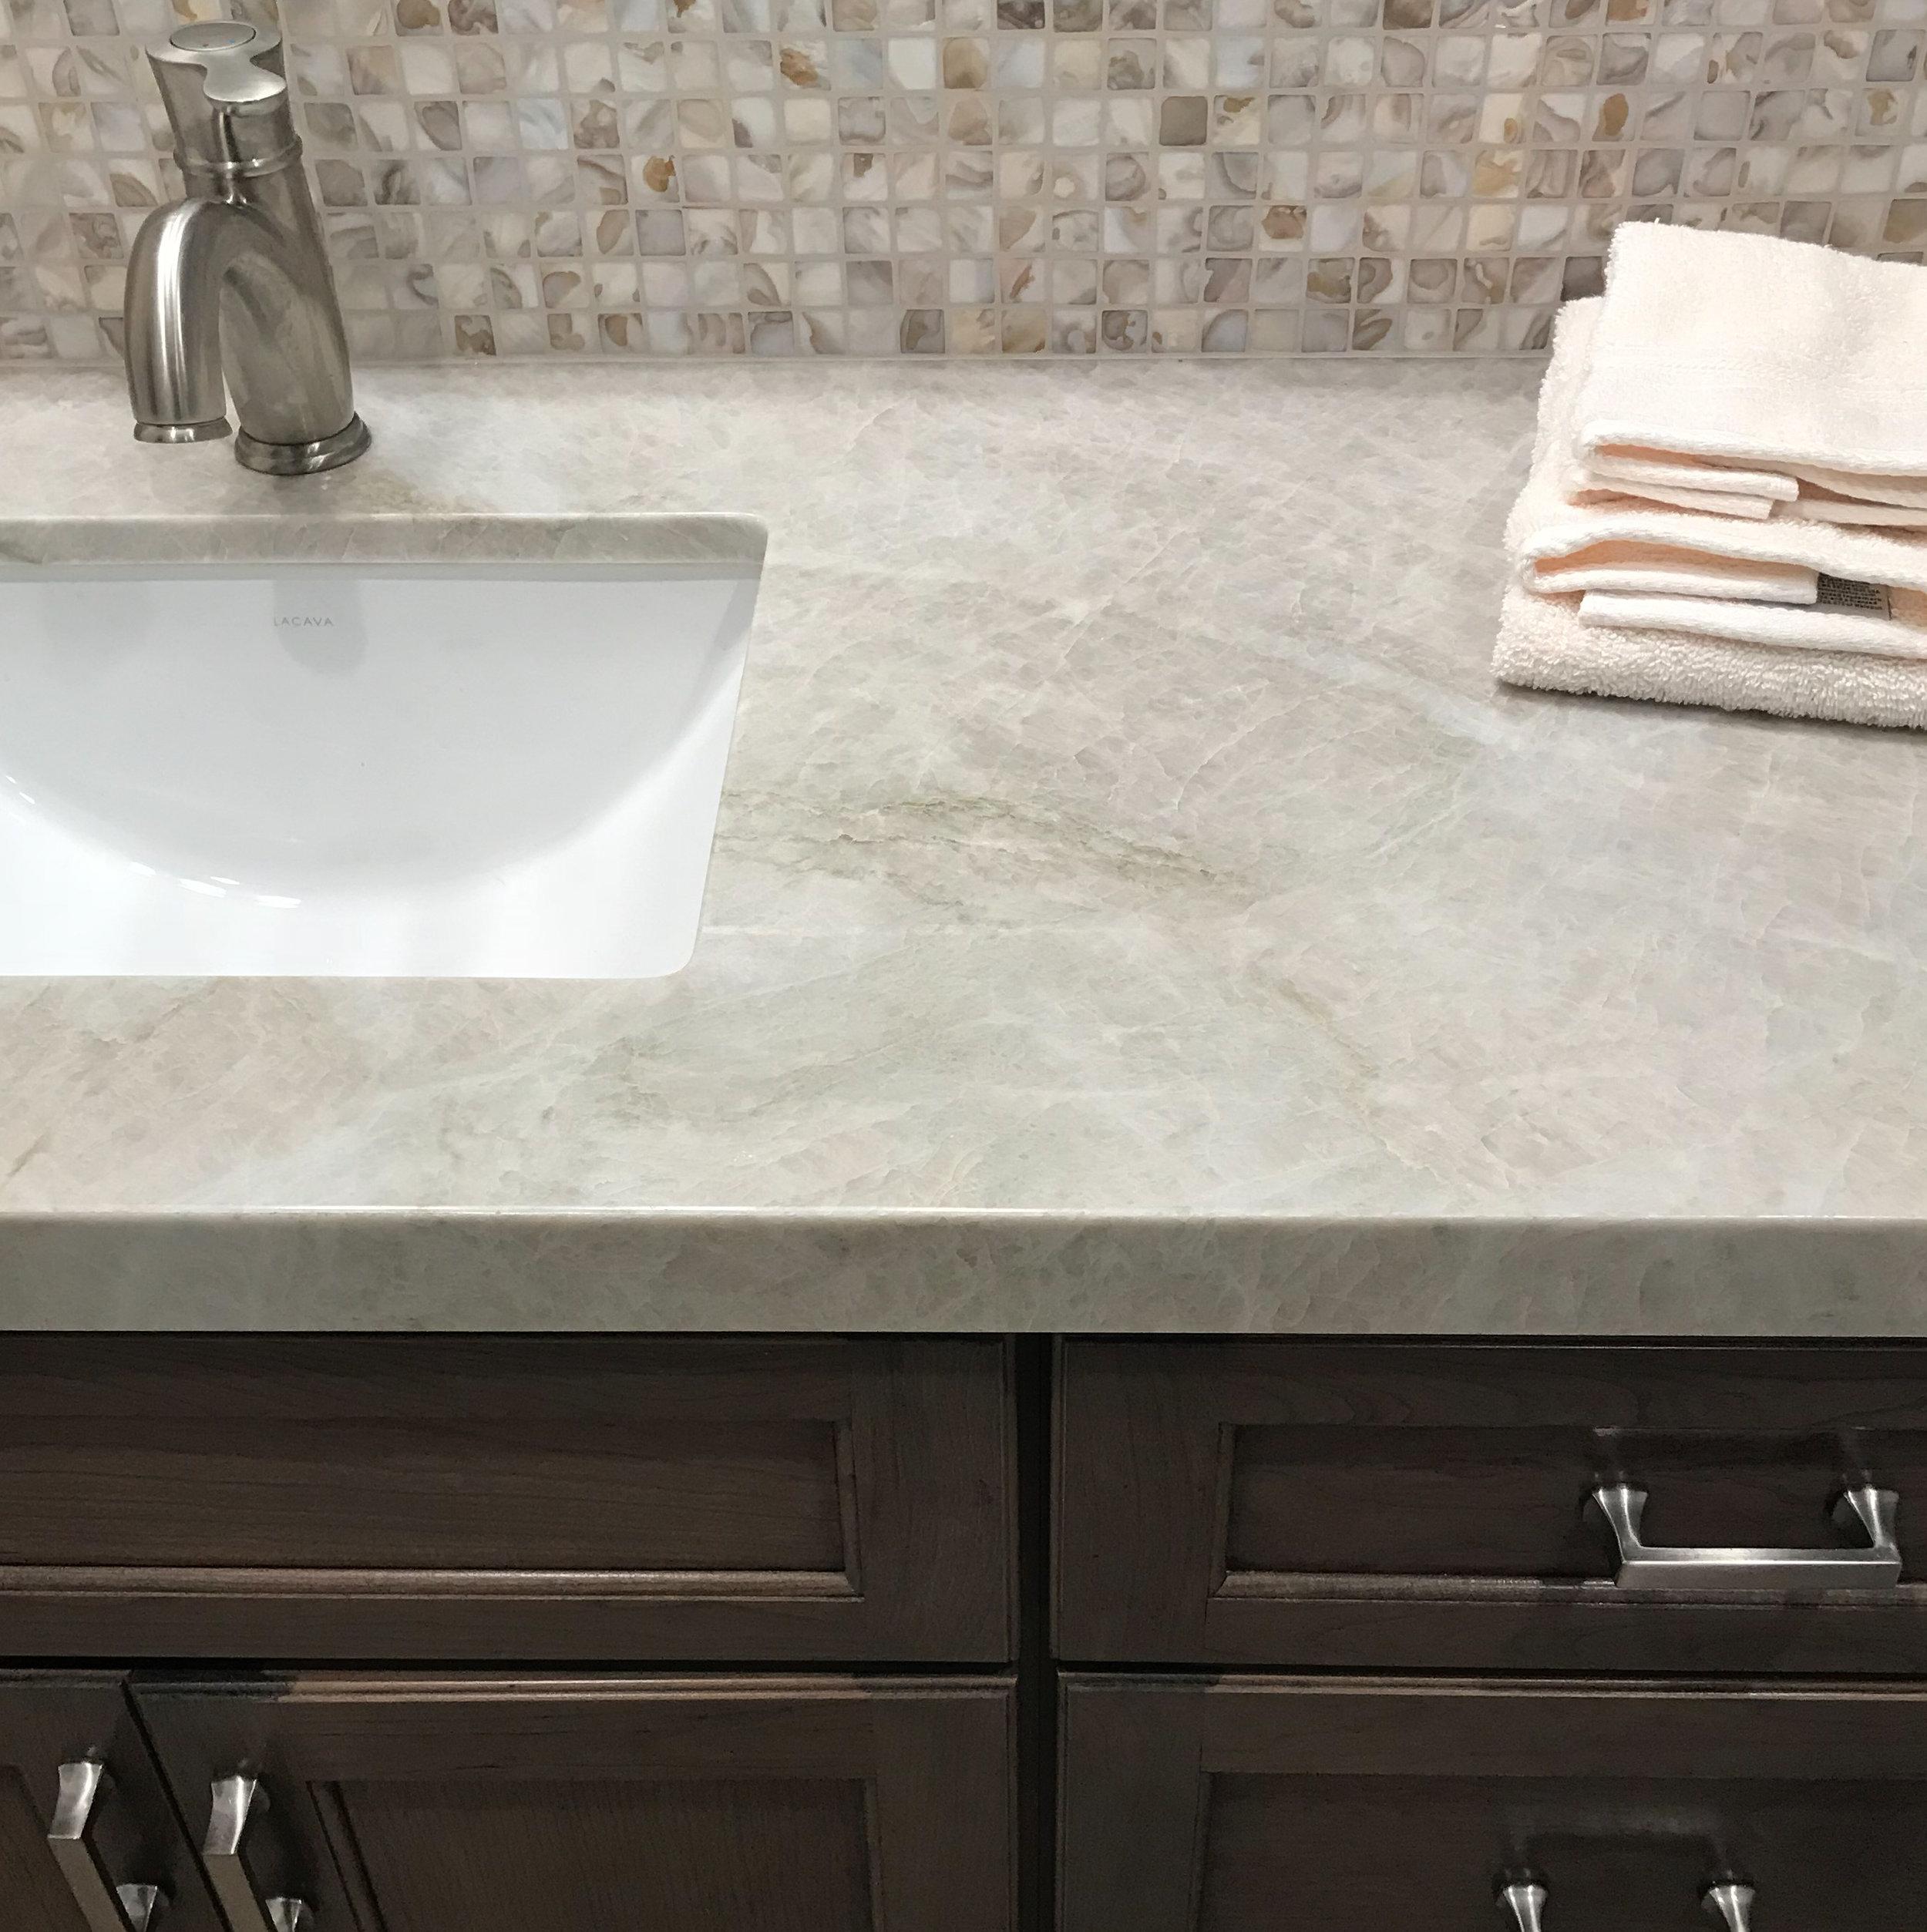 Quartzite countertop on a vanity